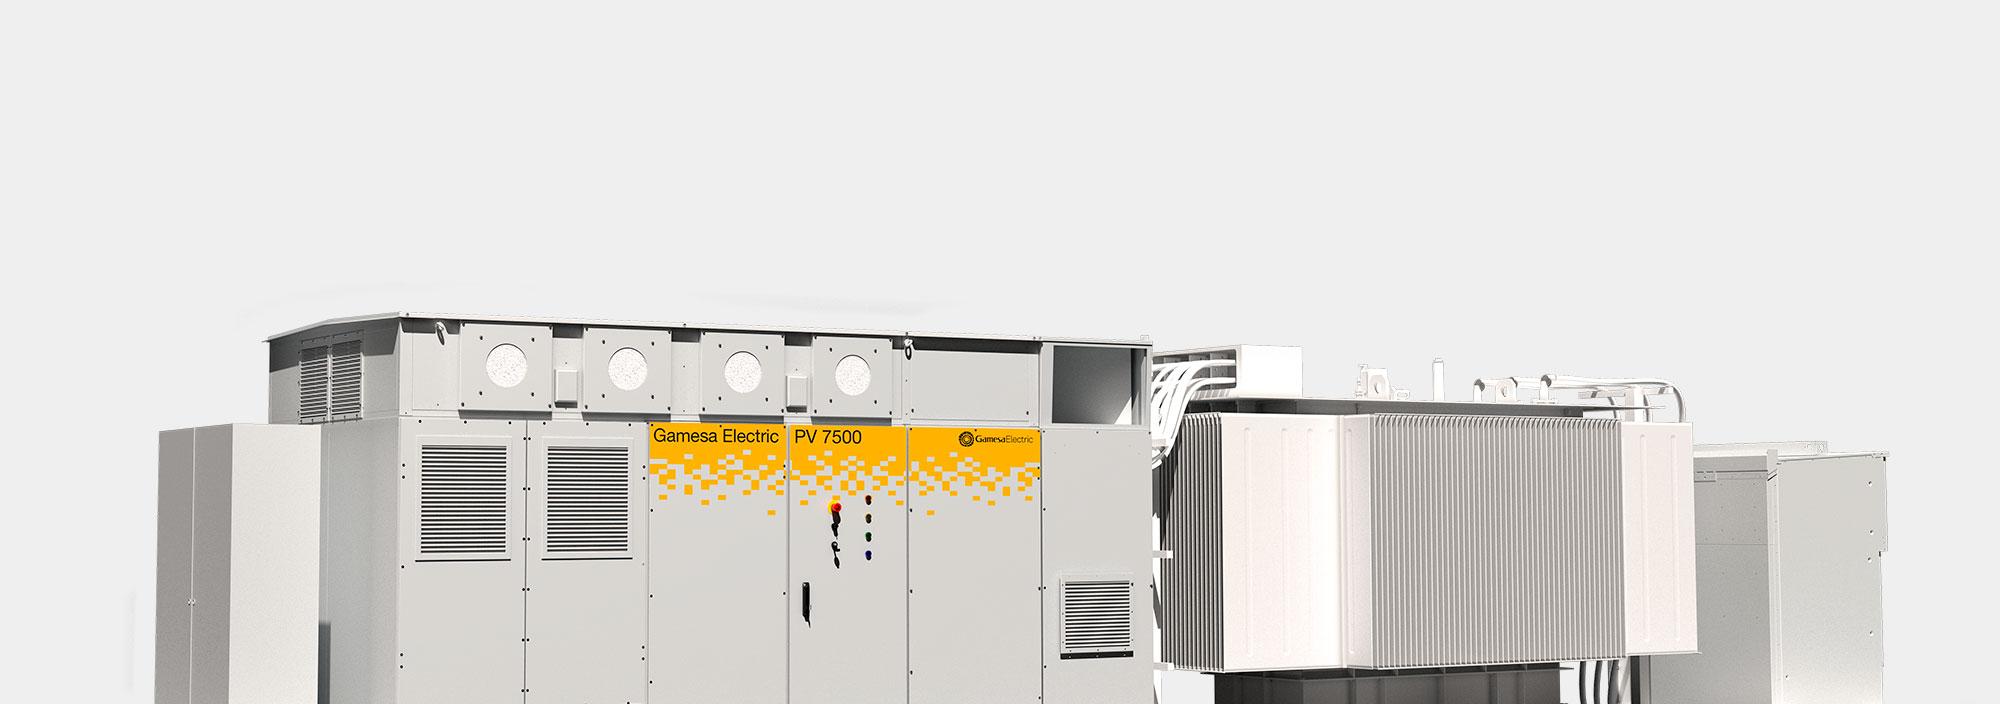 Gamesa Electric PV Station 7500